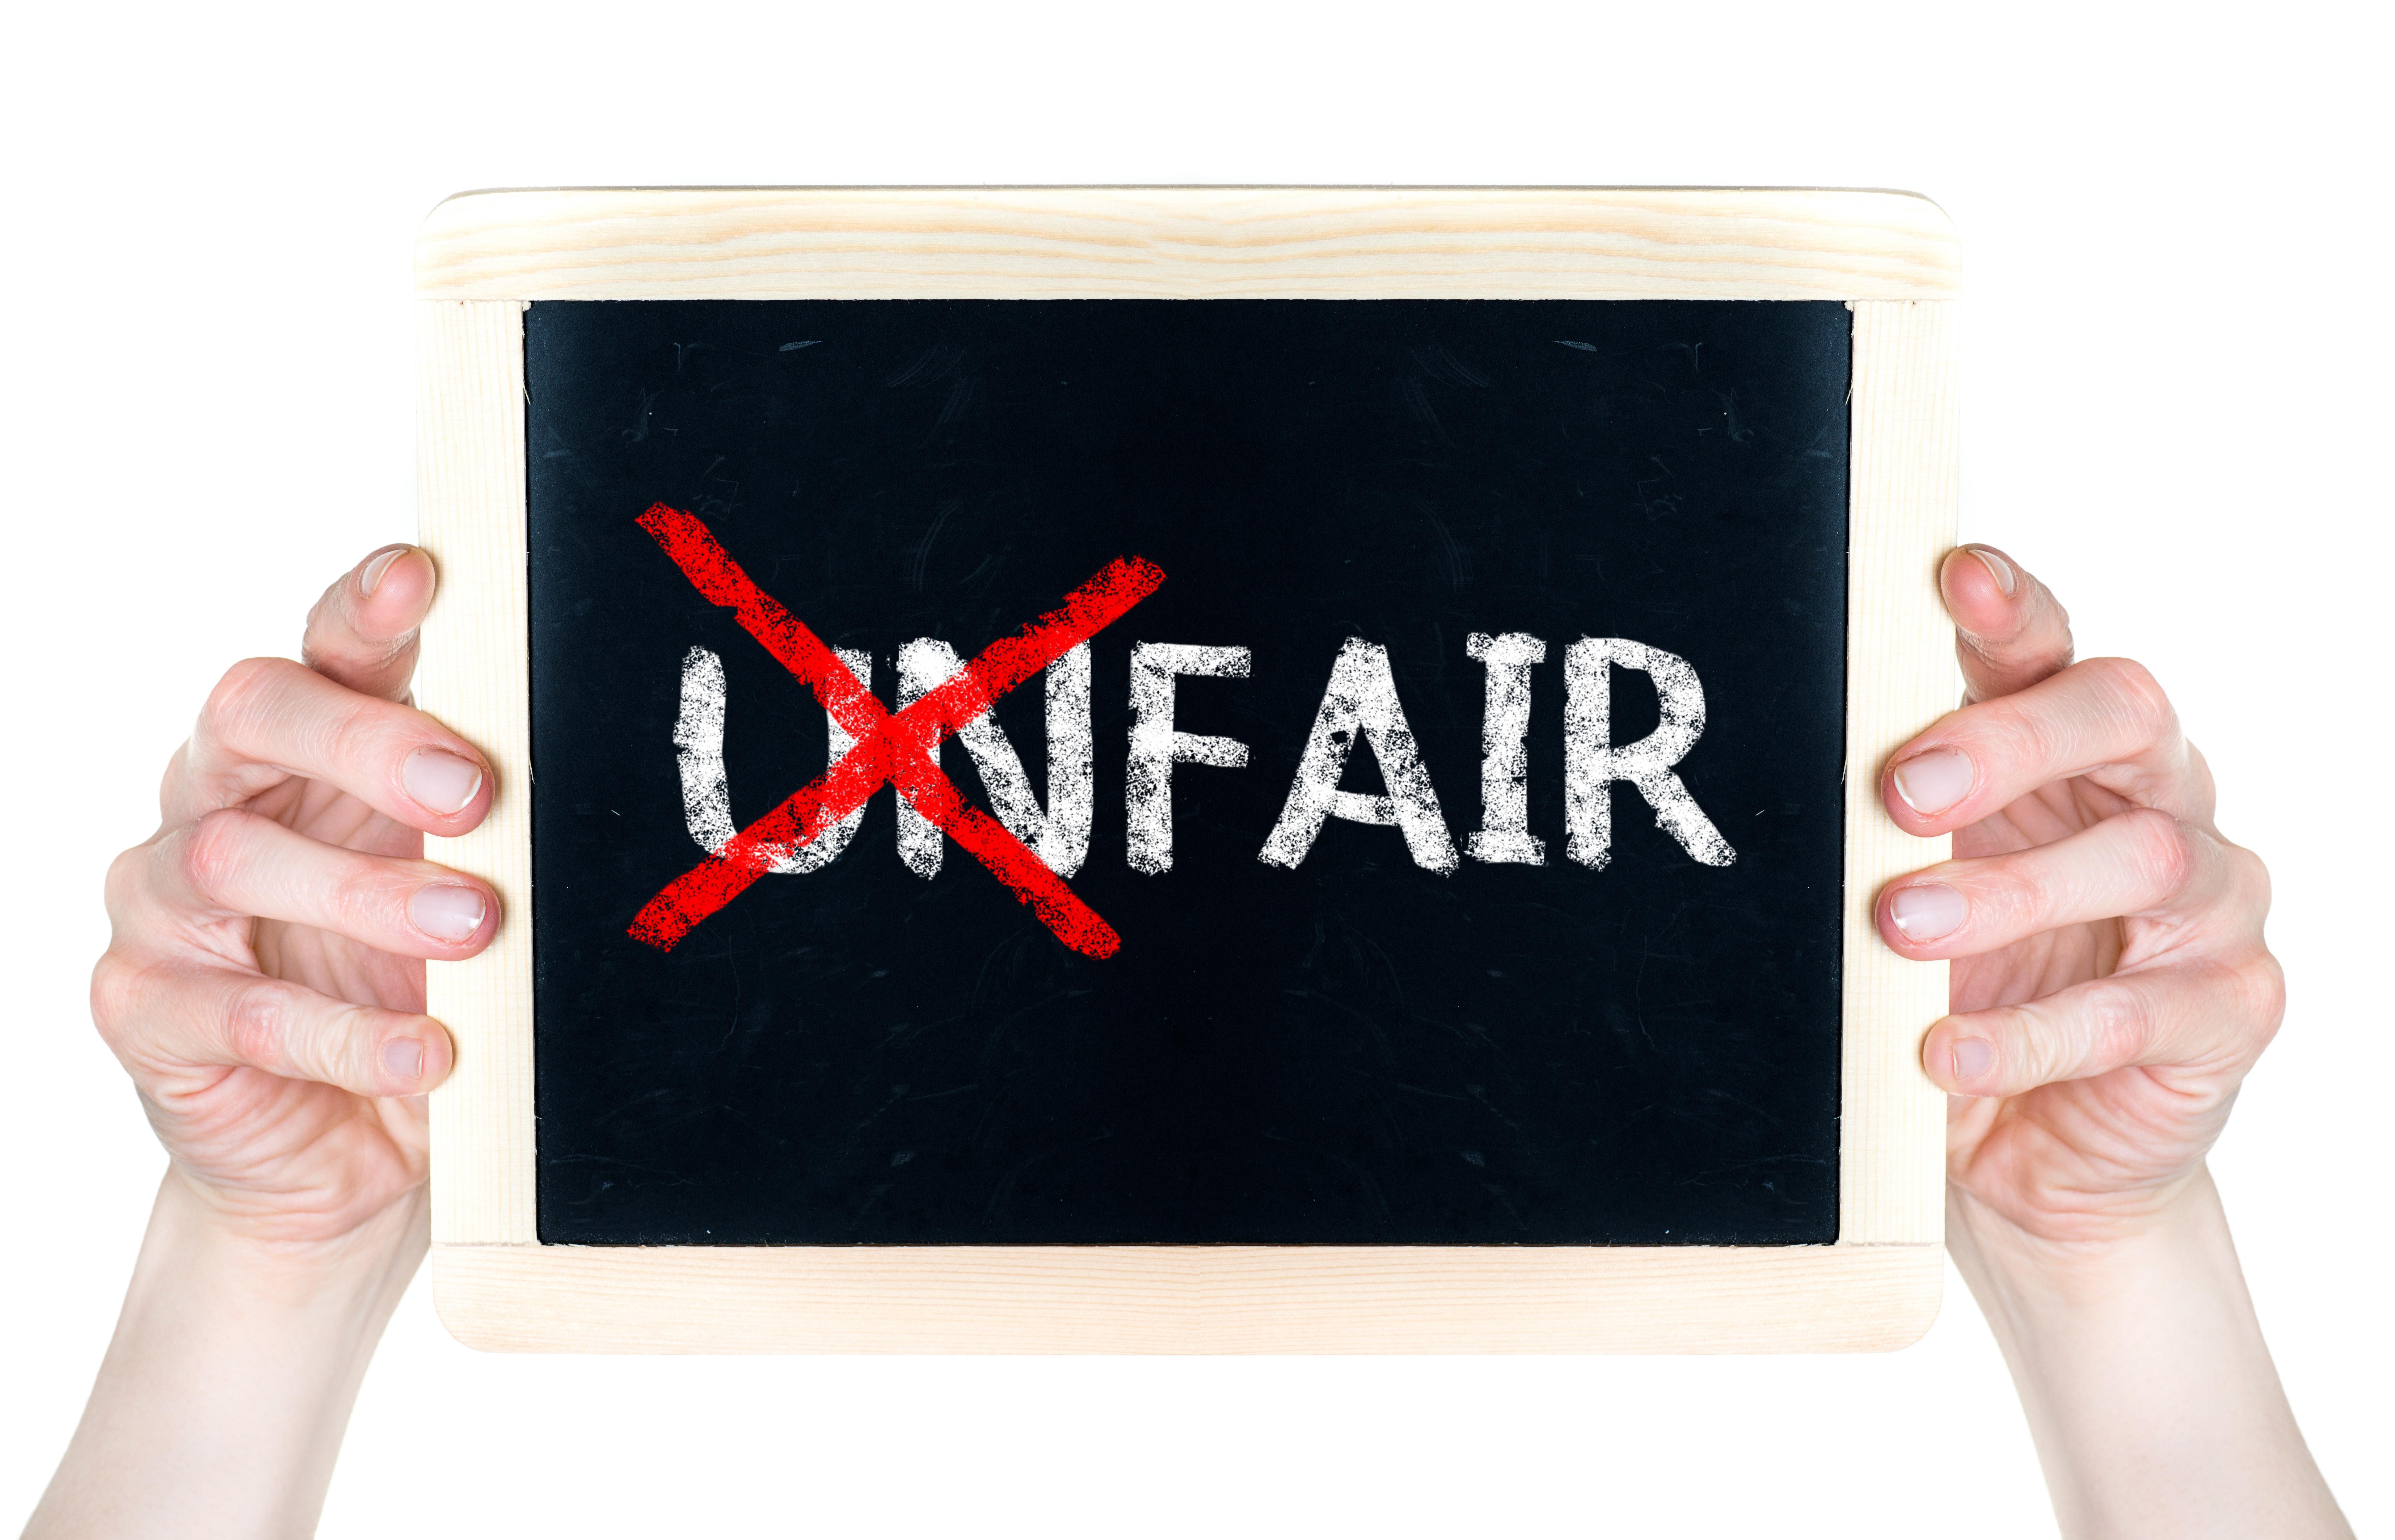 https://depositphotos.com/39577125/stock-photo-unfair-fair.html